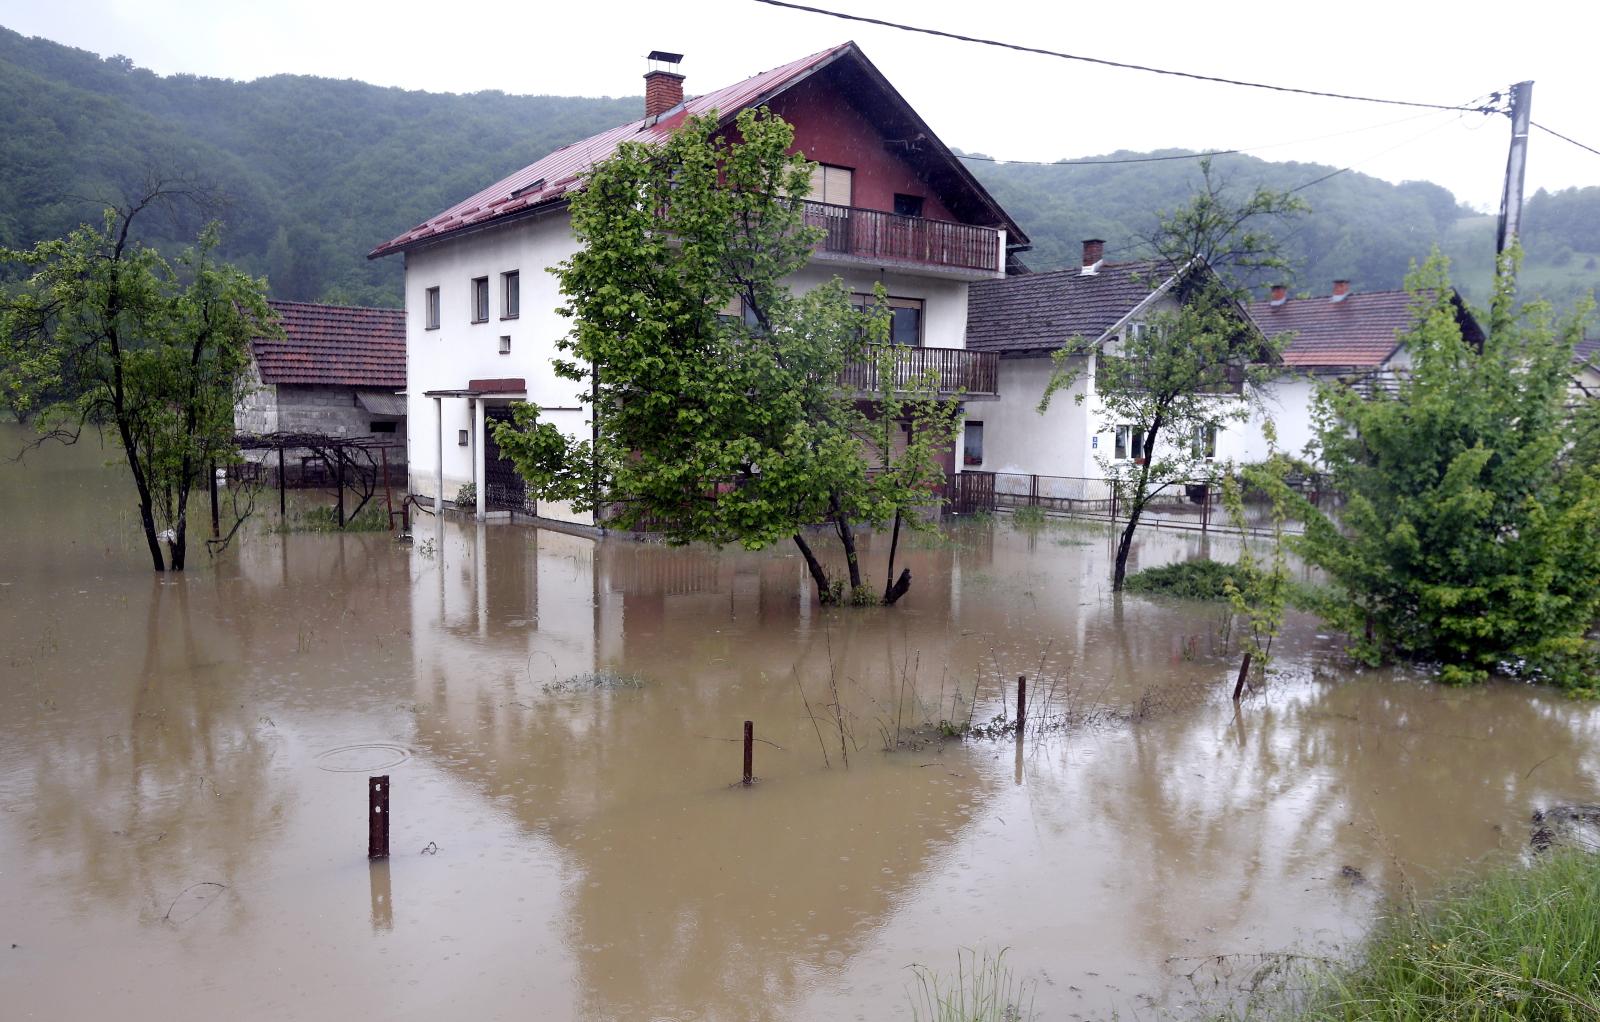 Powódź w Bośni  EPA/FEHIM DEMIR